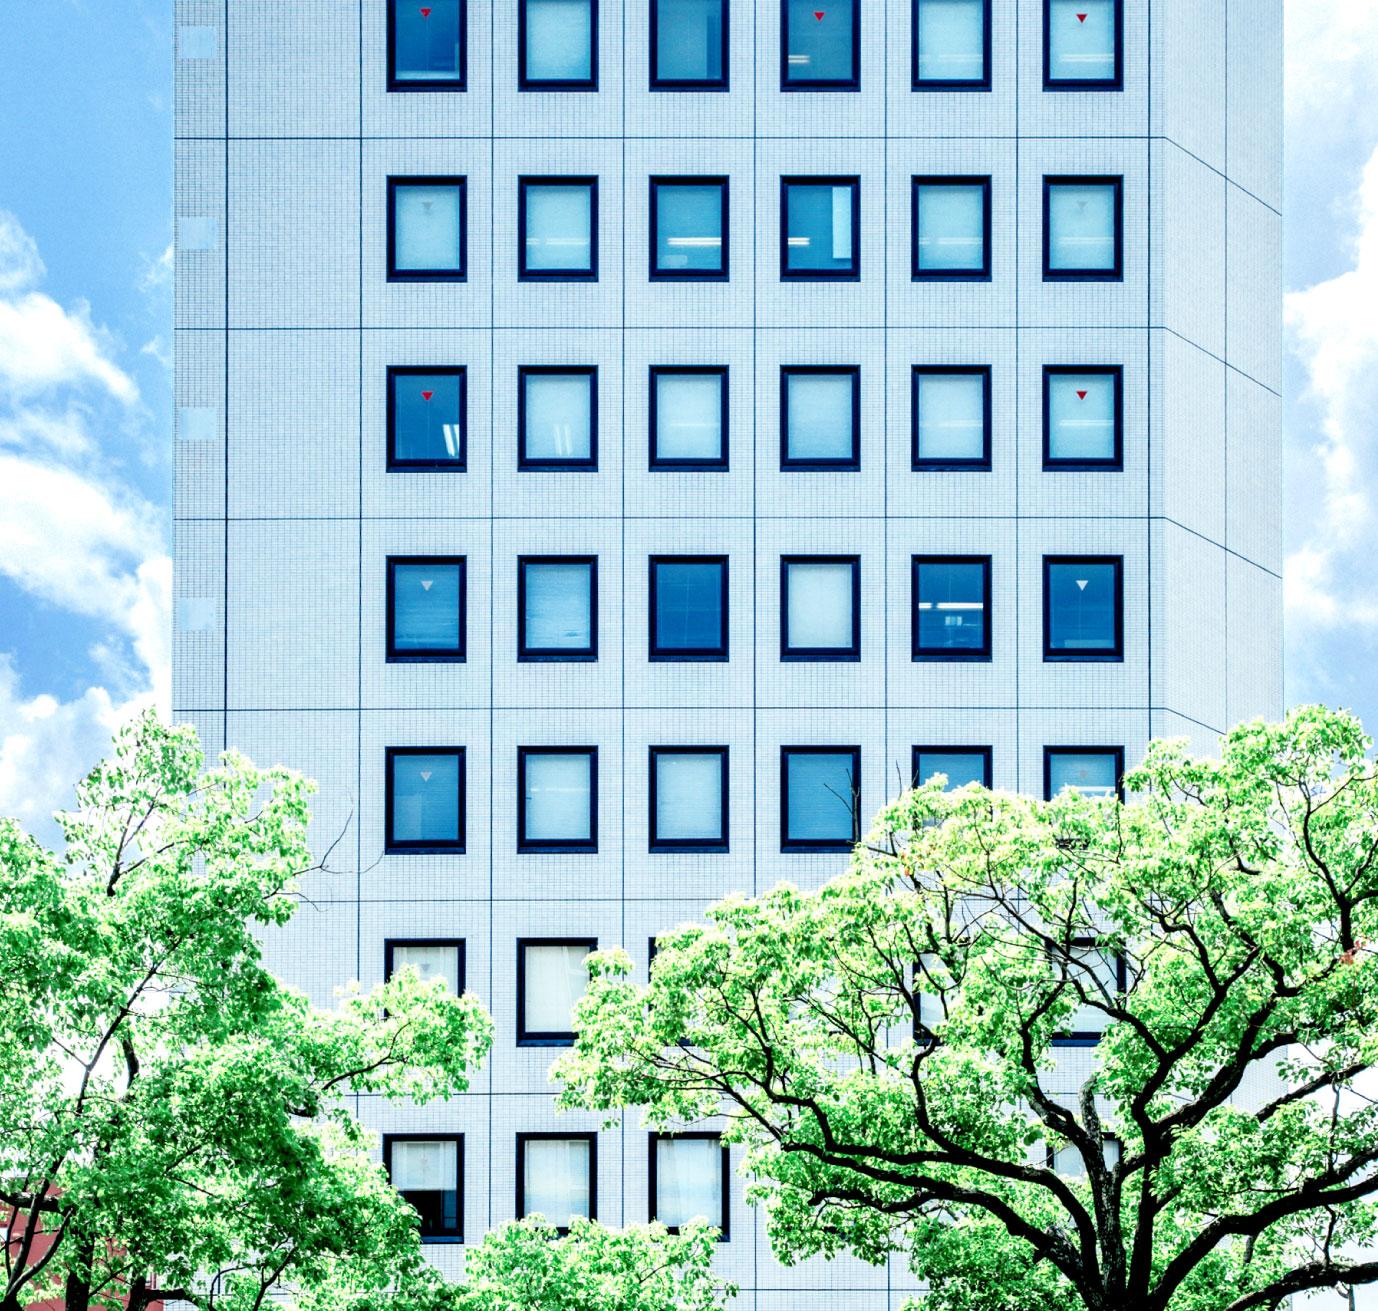 royal tower ロイヤルタワー 広島県広島市南区稲荷町1番1号